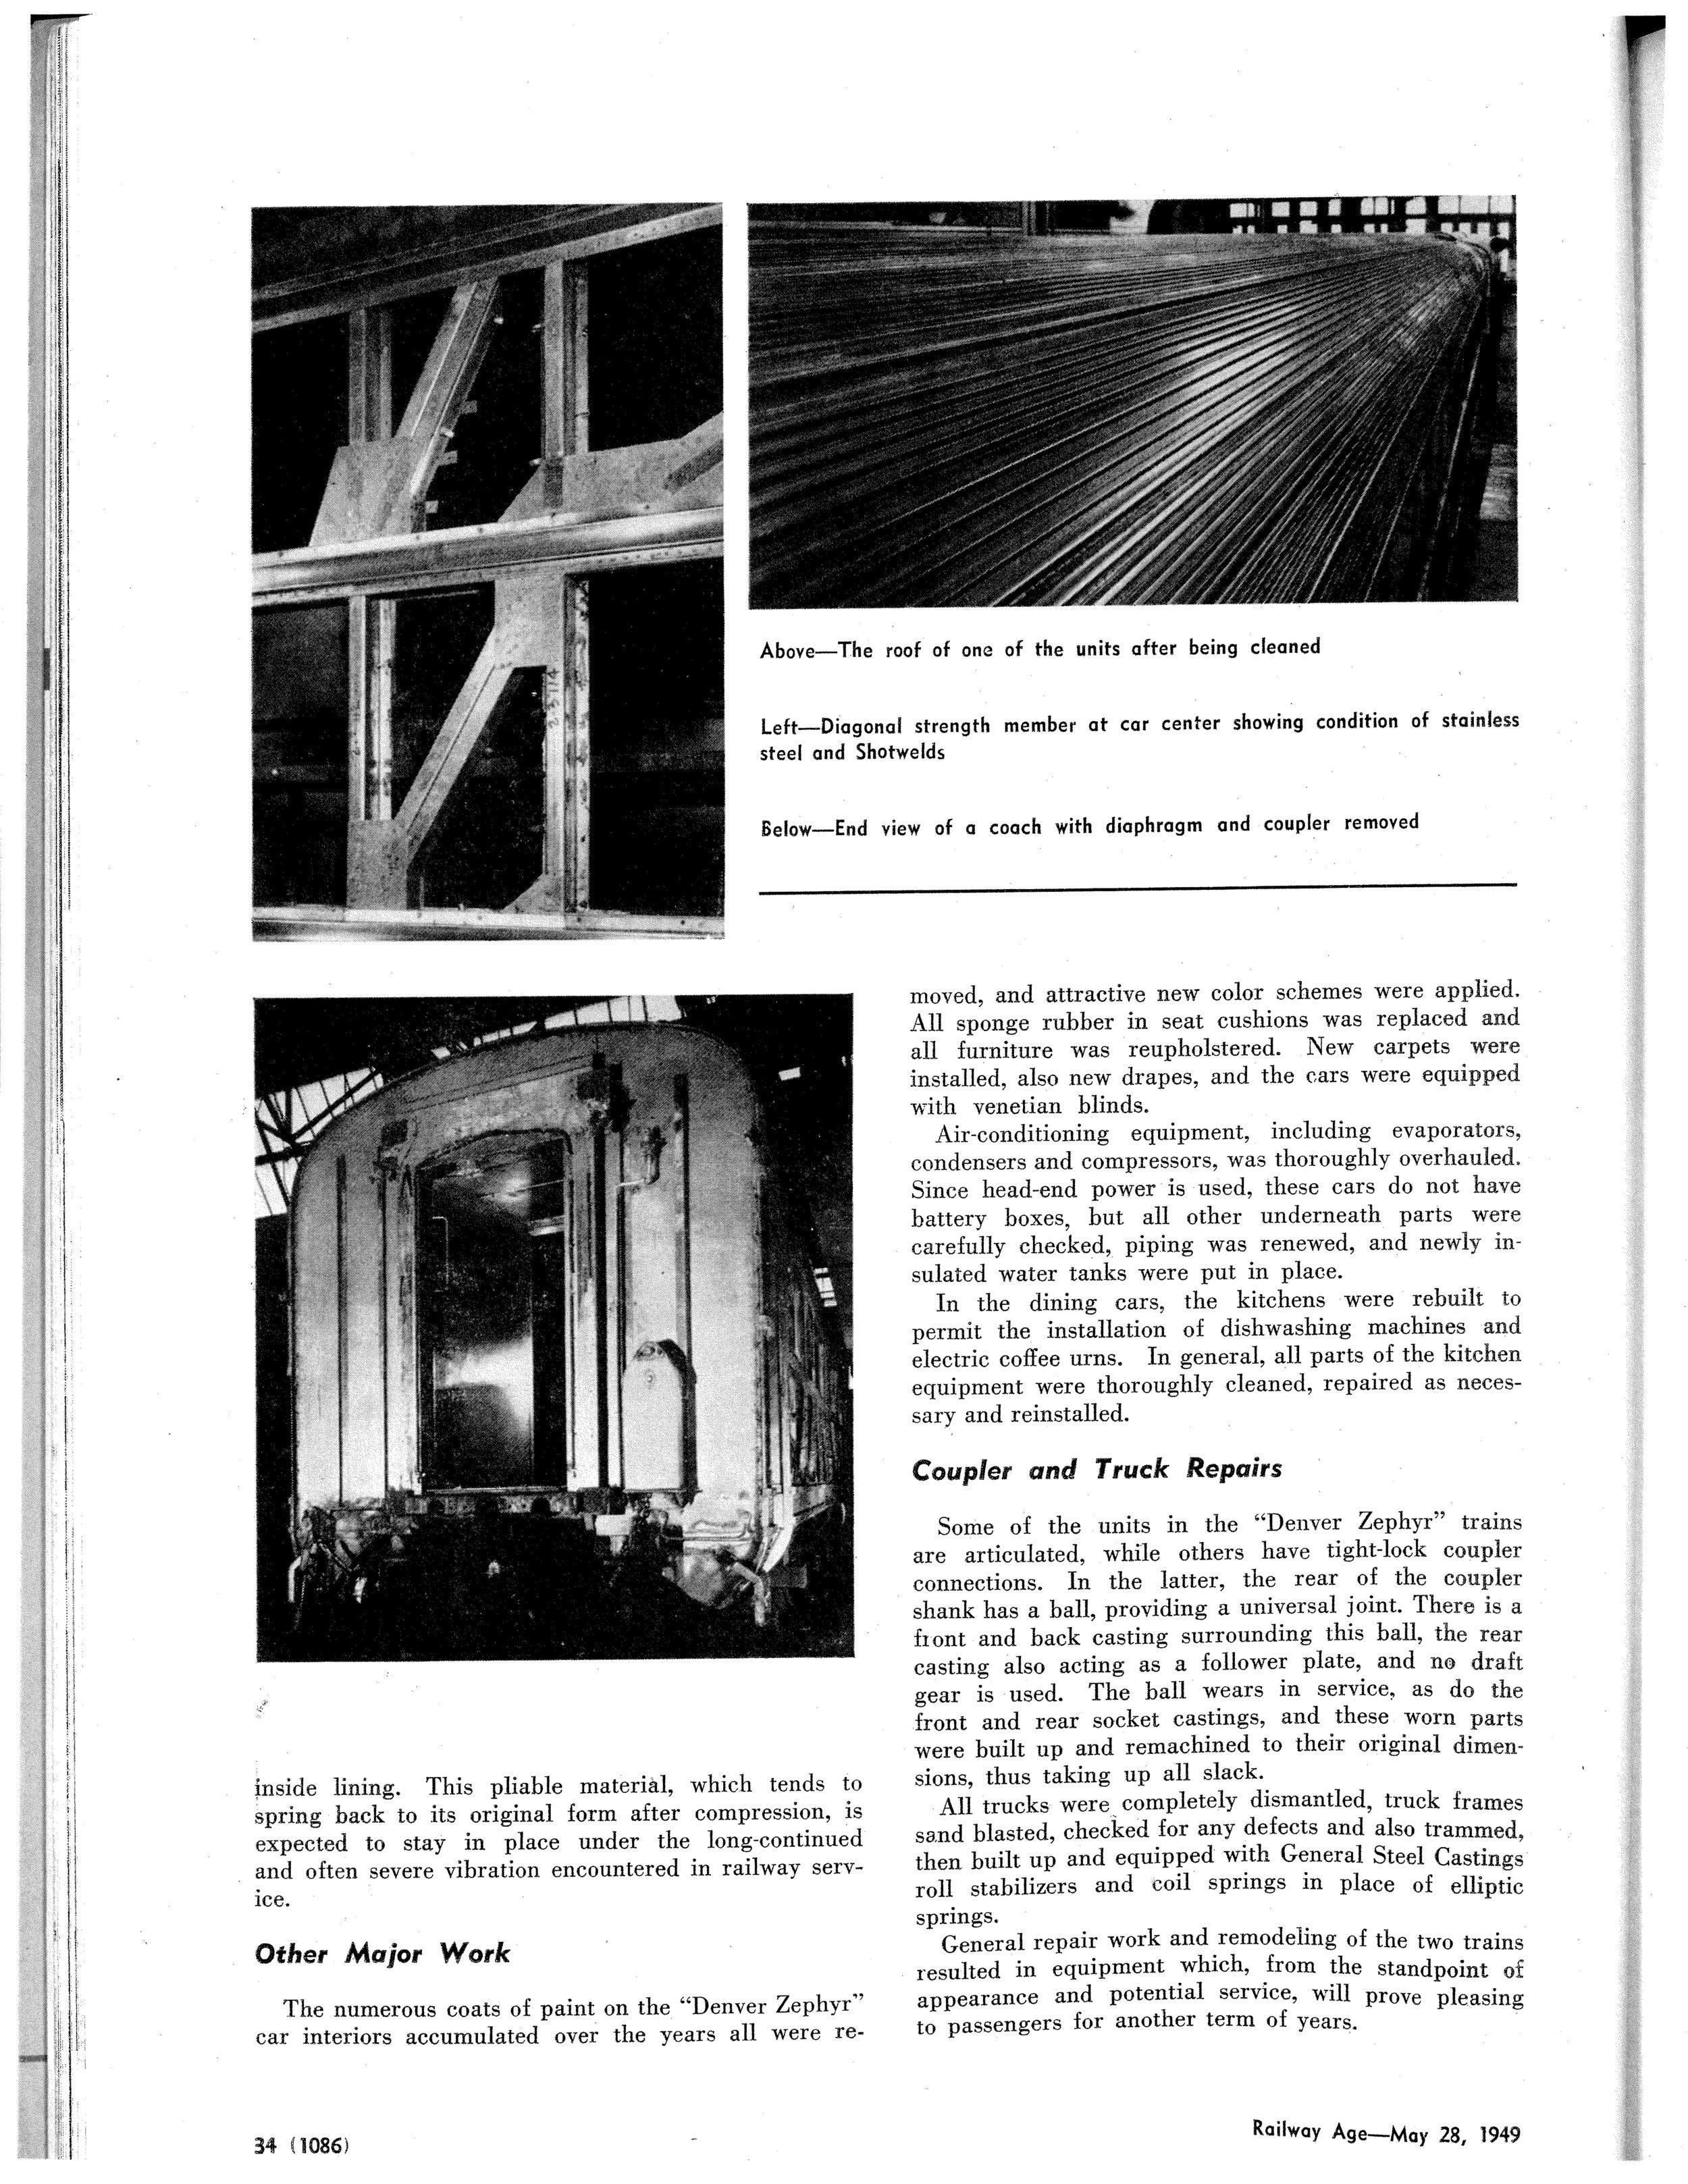 1949+Railway+Age+Article+on+car+updates 3.jpg